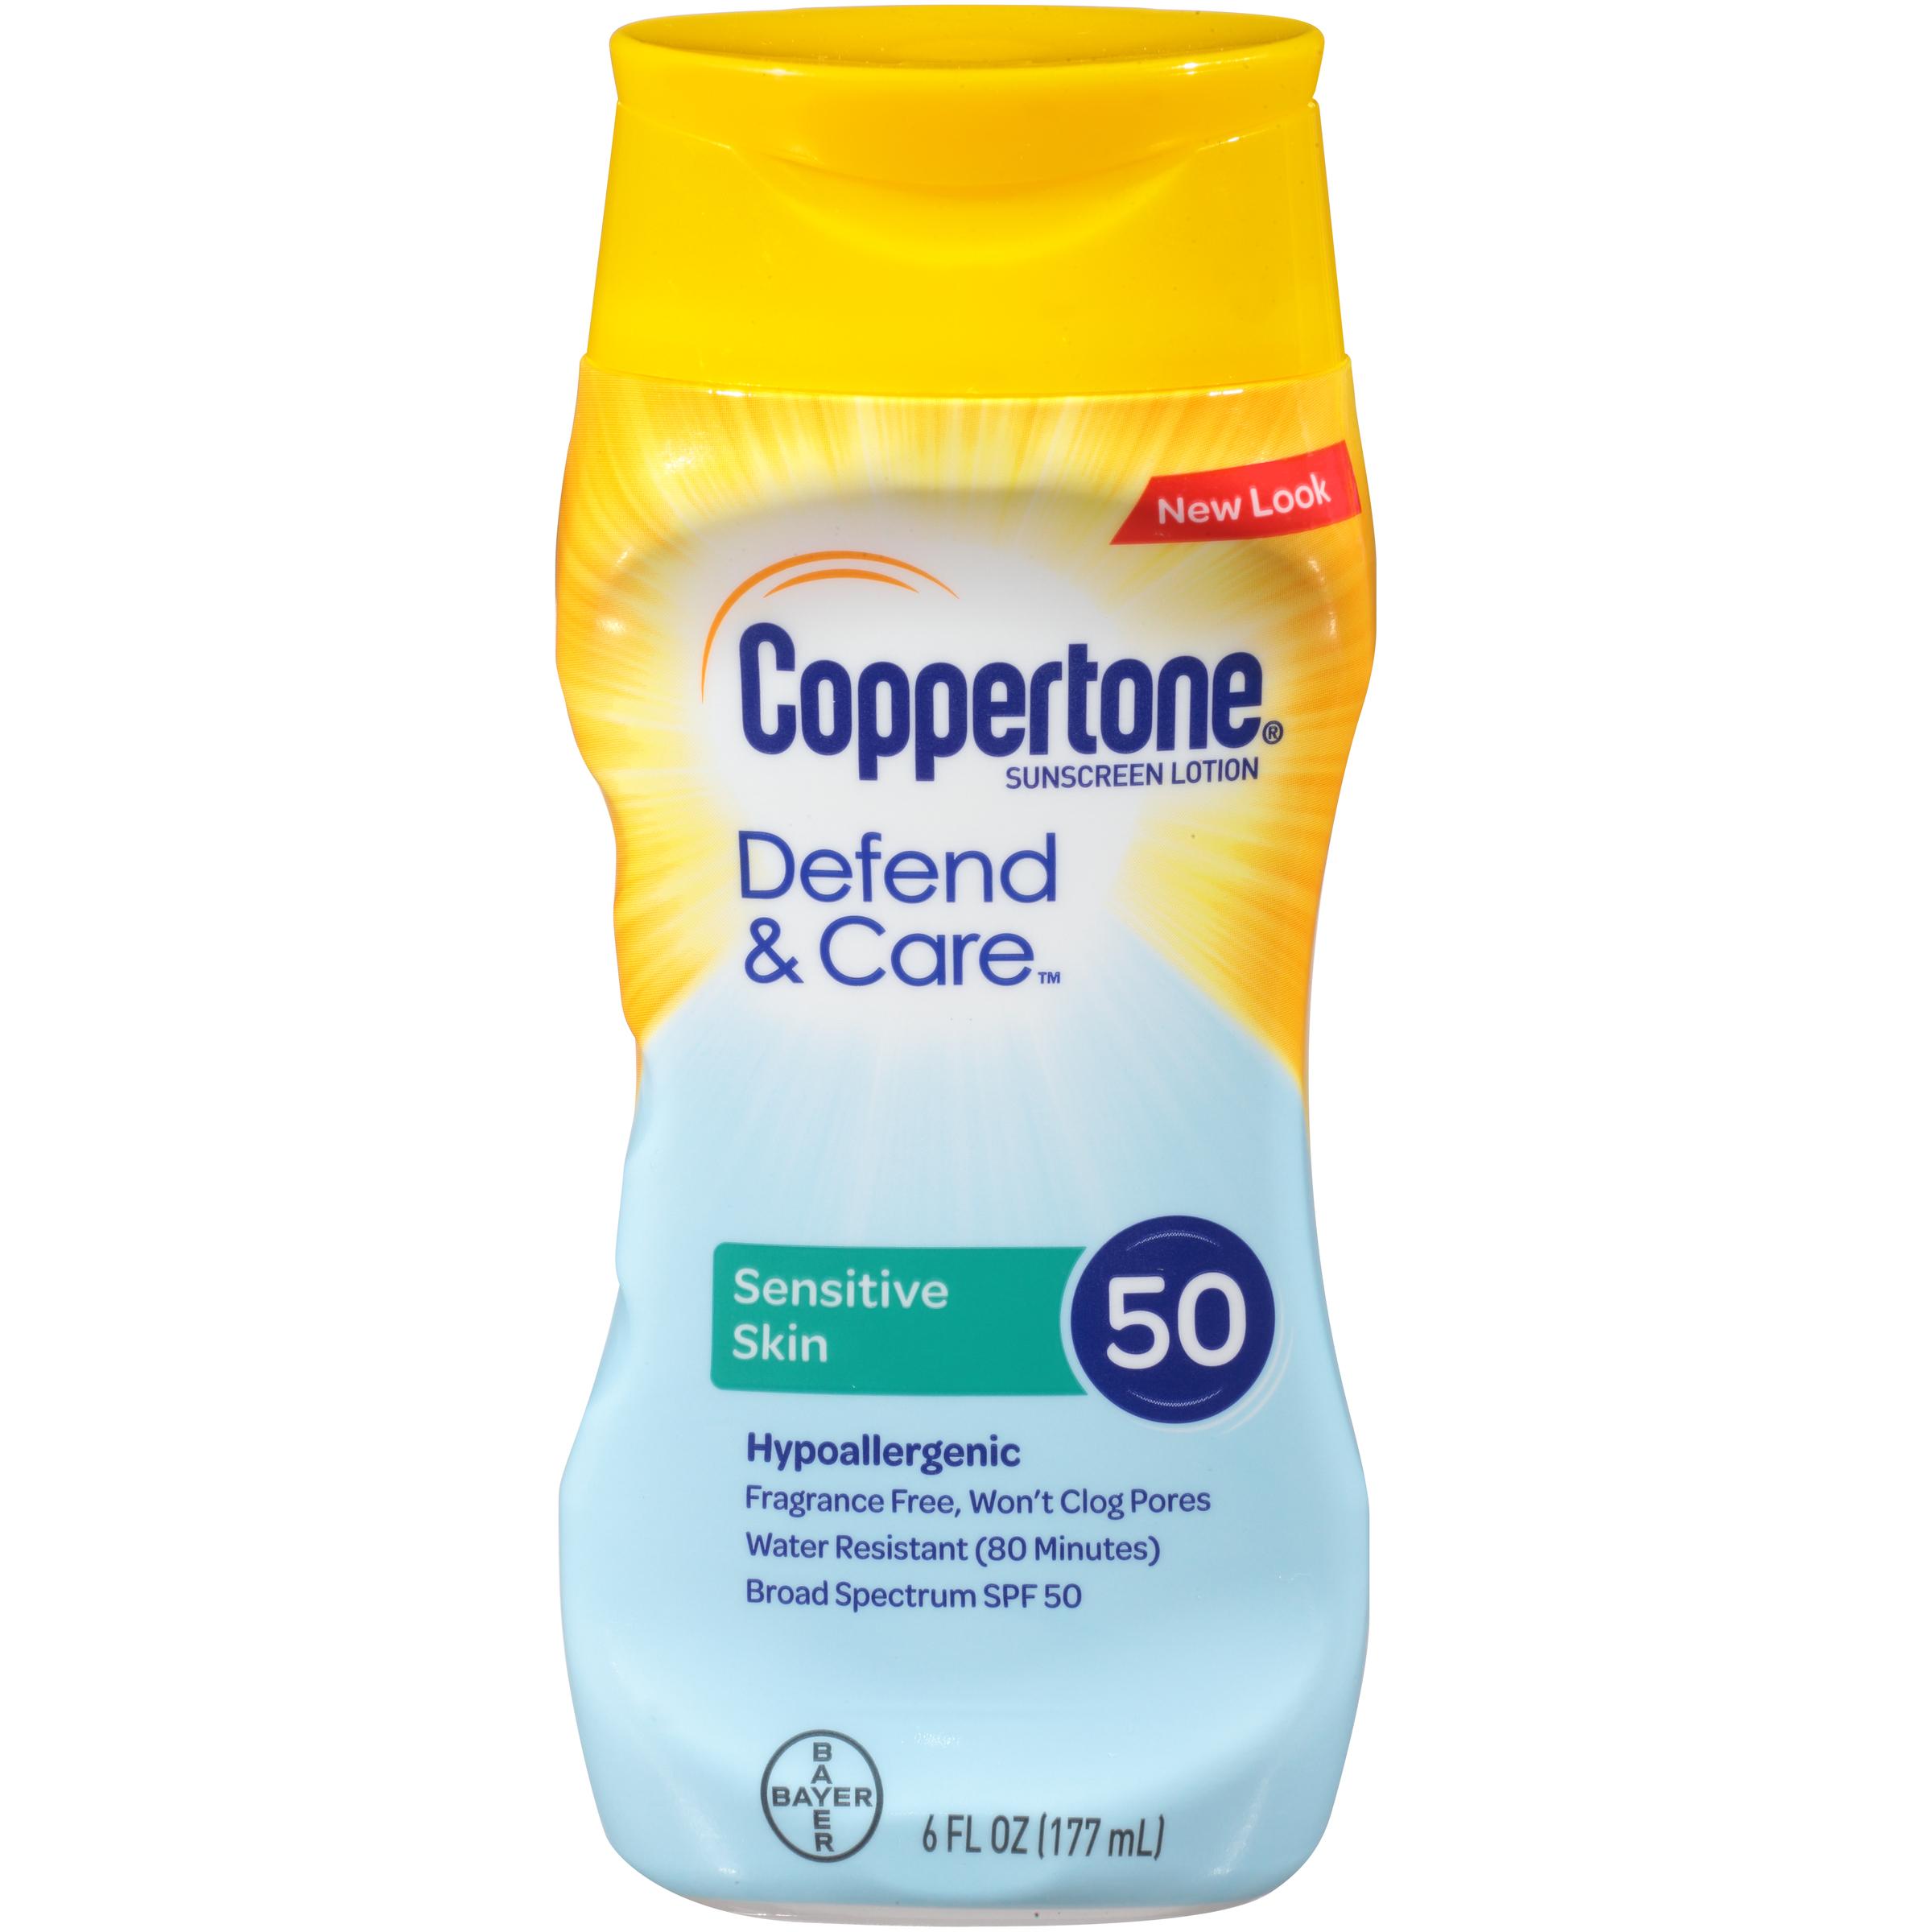 Coppertone Defend & Care Sensitive Skin Sunscreen SPF 50 Lotion 6 oz